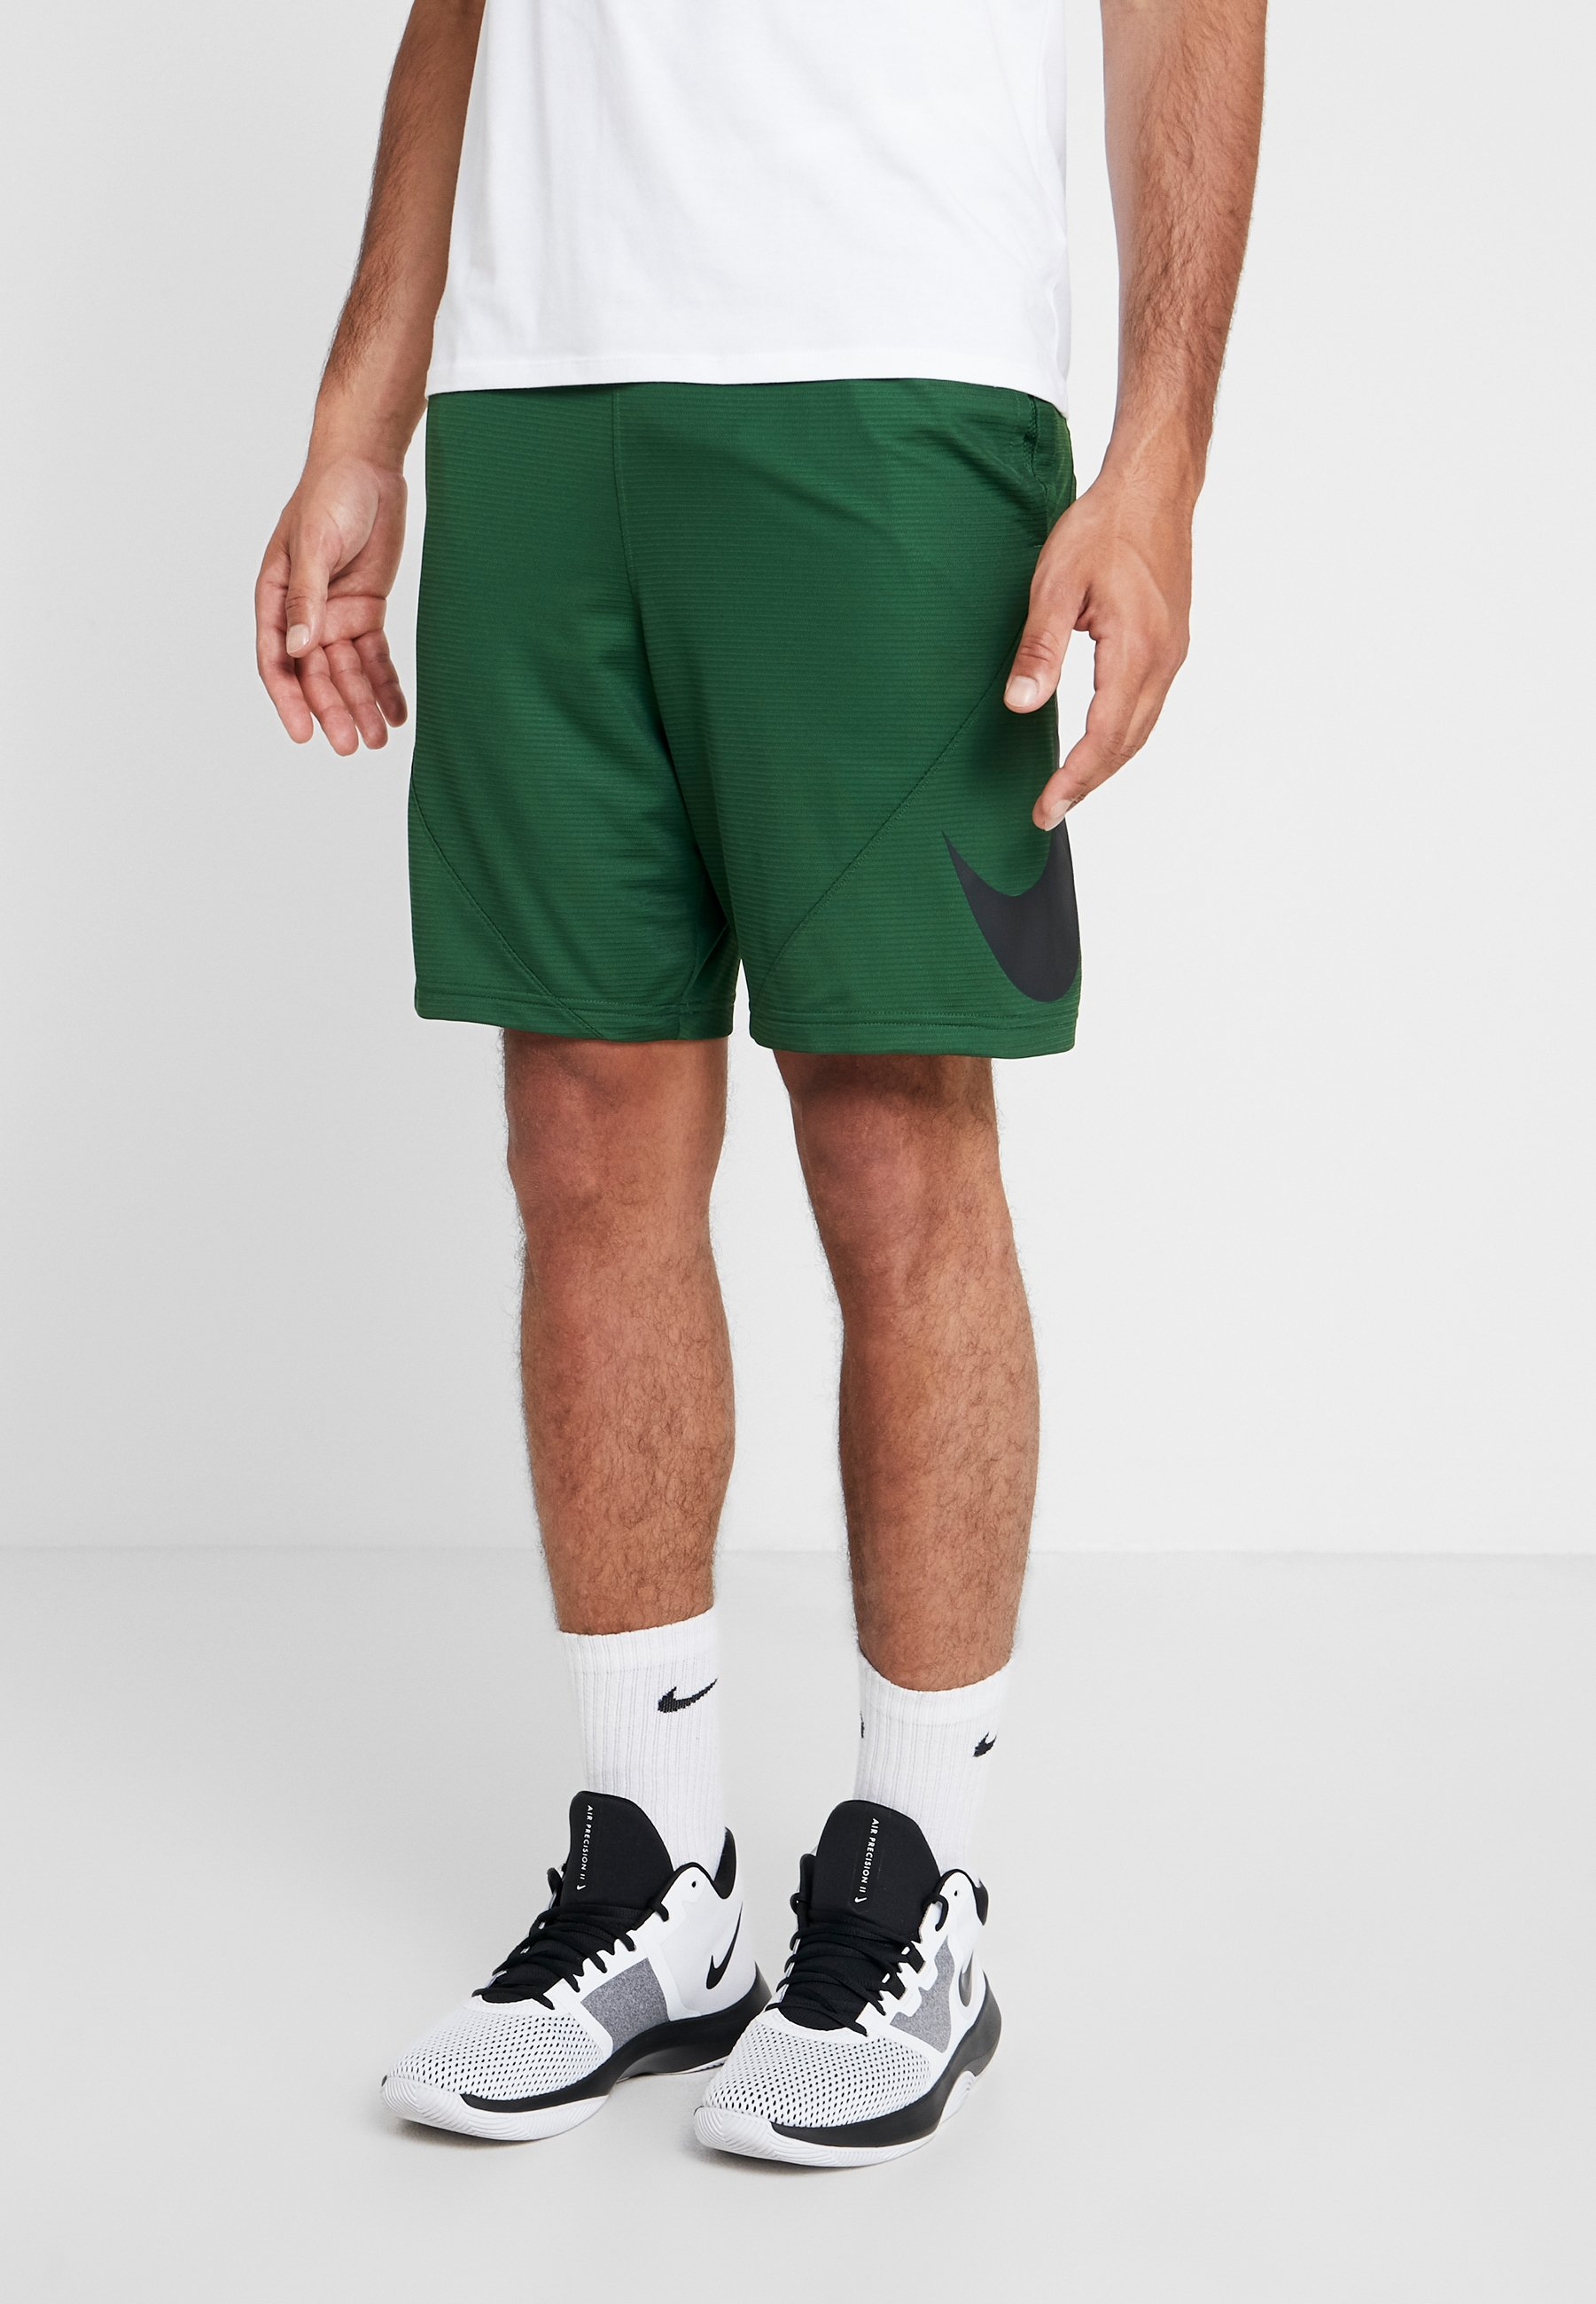 Bonsai Cosmic ShortDe black Nike Sport Performance YeE2IDWH9